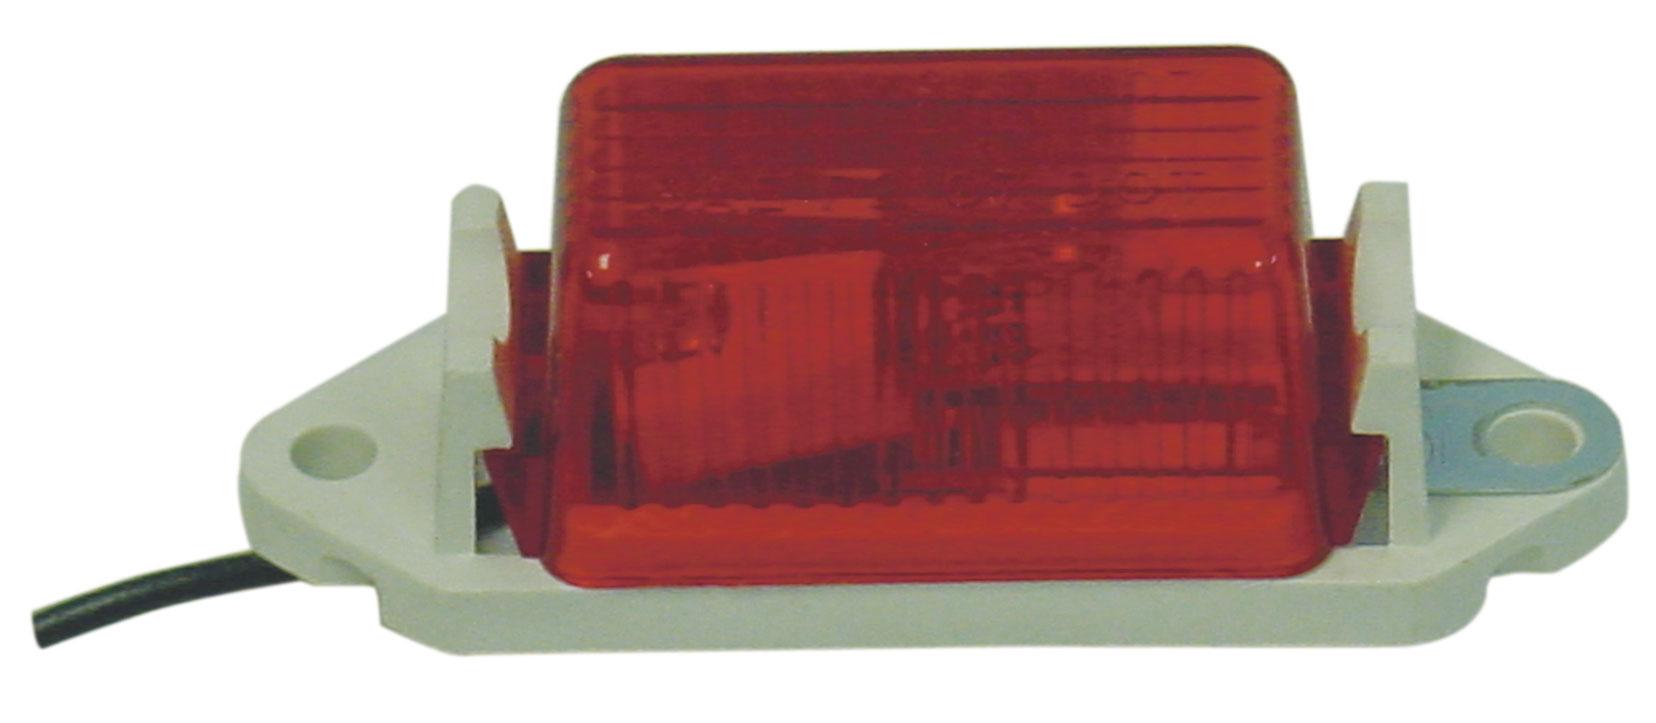 RED 2 HOLE SAEP2 97 DOT MARKER LIGHT